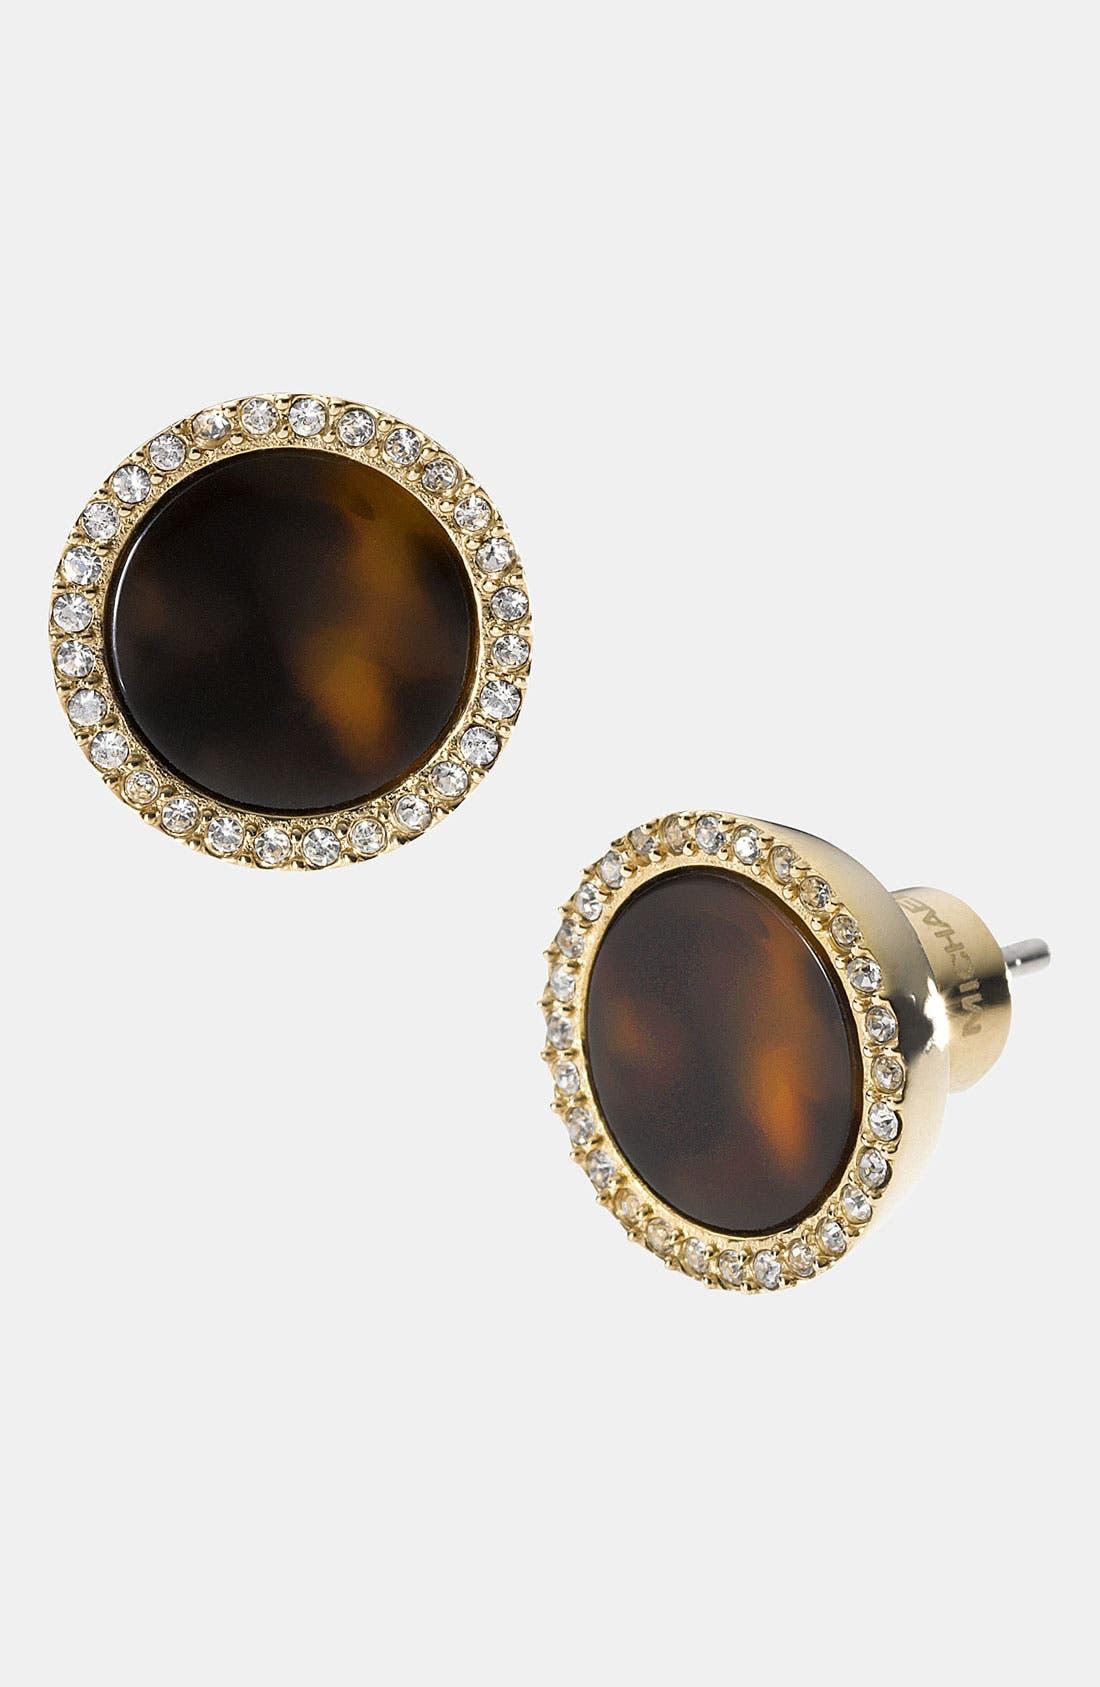 Alternate Image 1 Selected - Michael Kors 'Brilliance' Stud Earrings